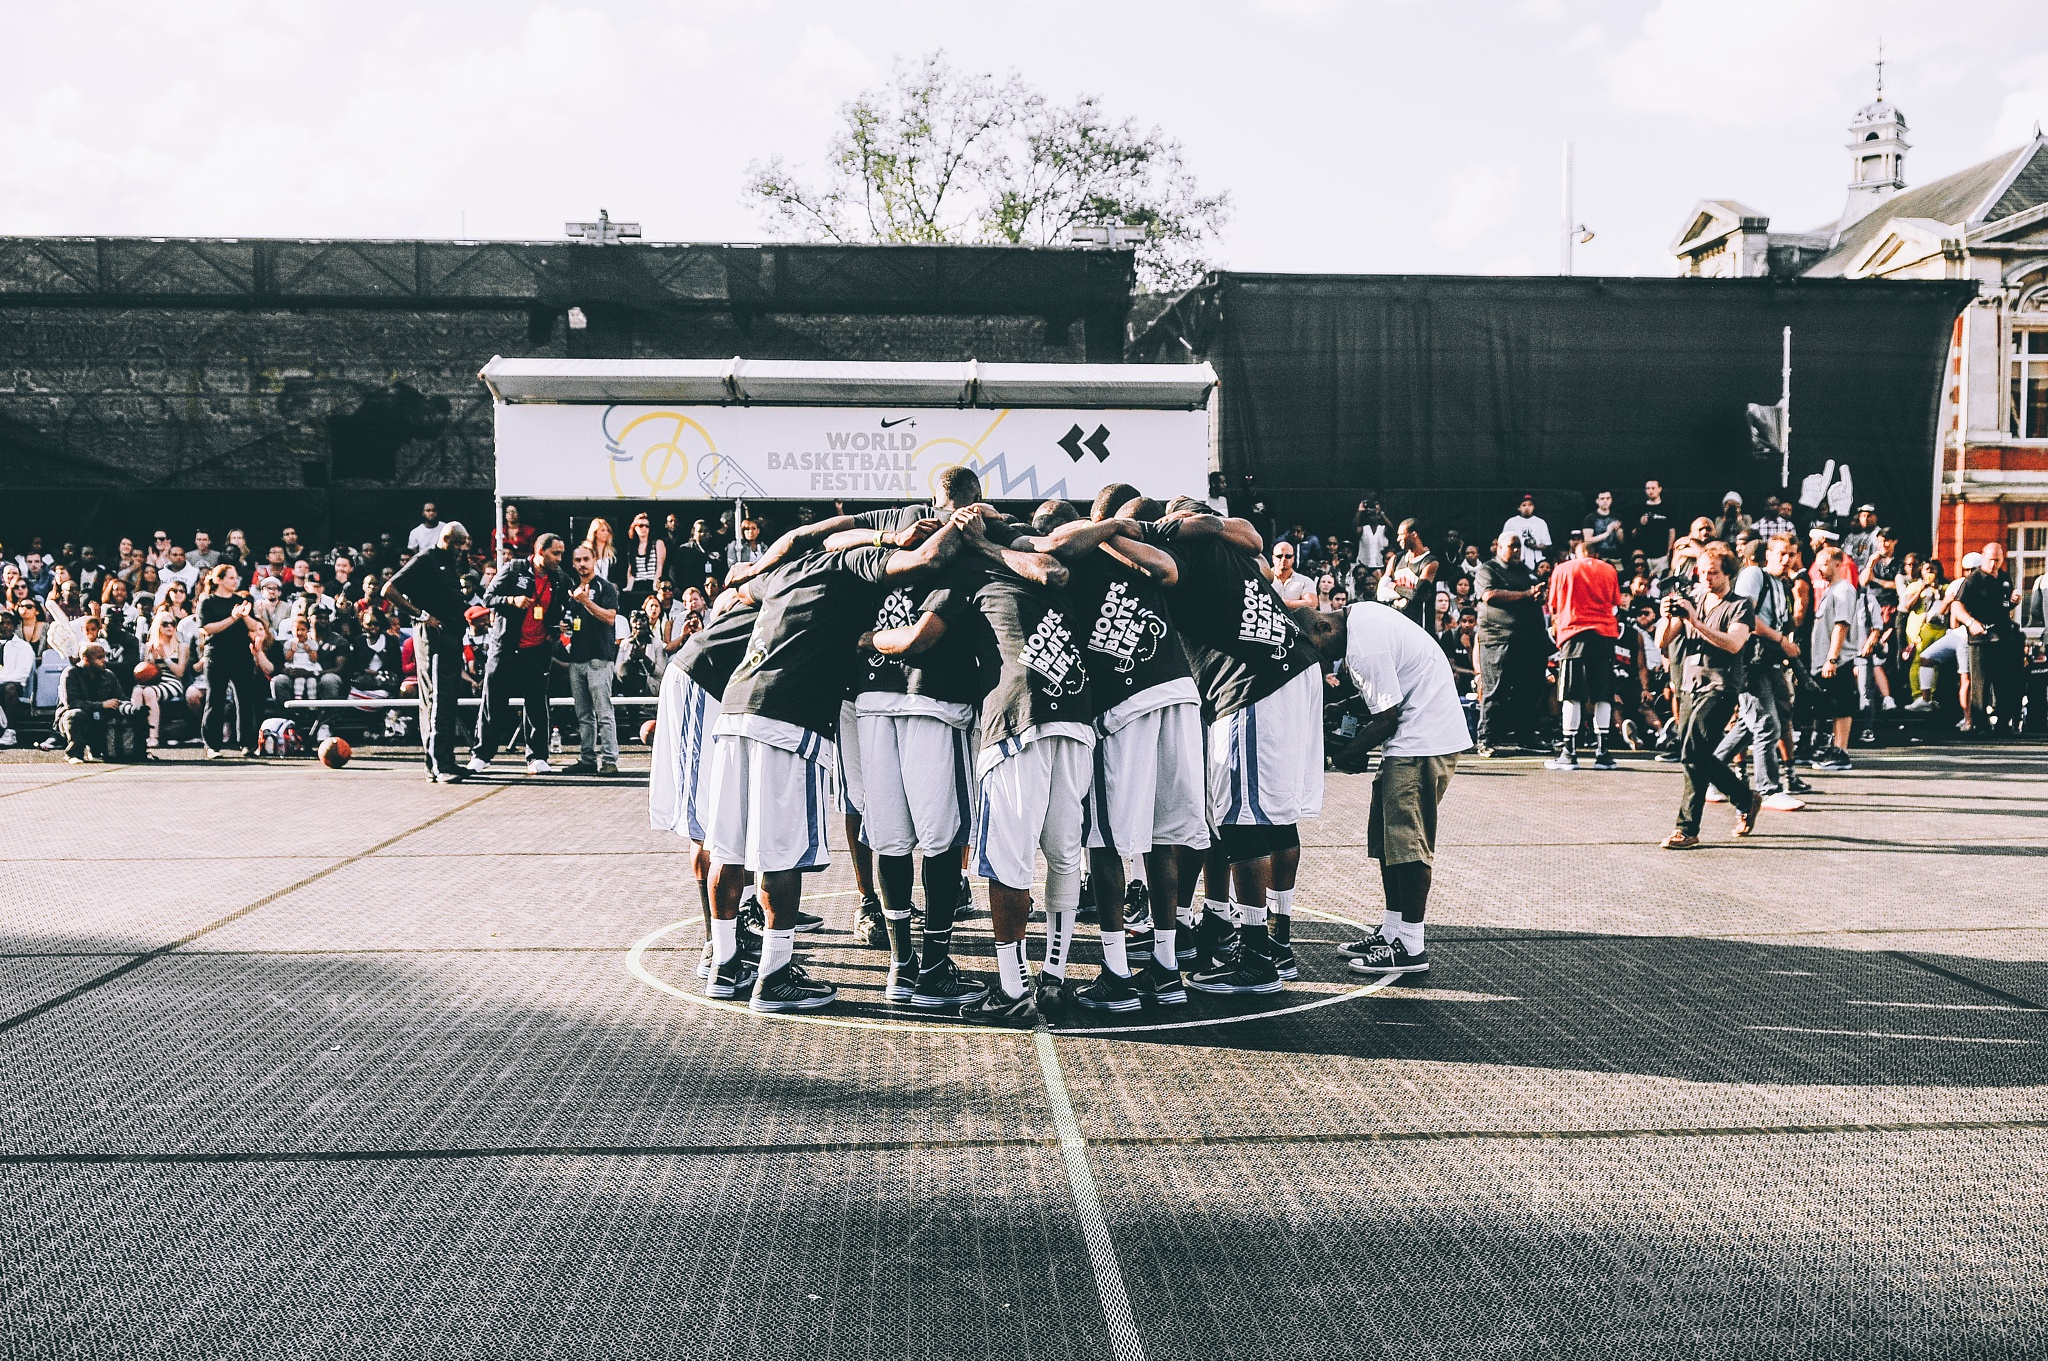 Teamwork by bemorephotos